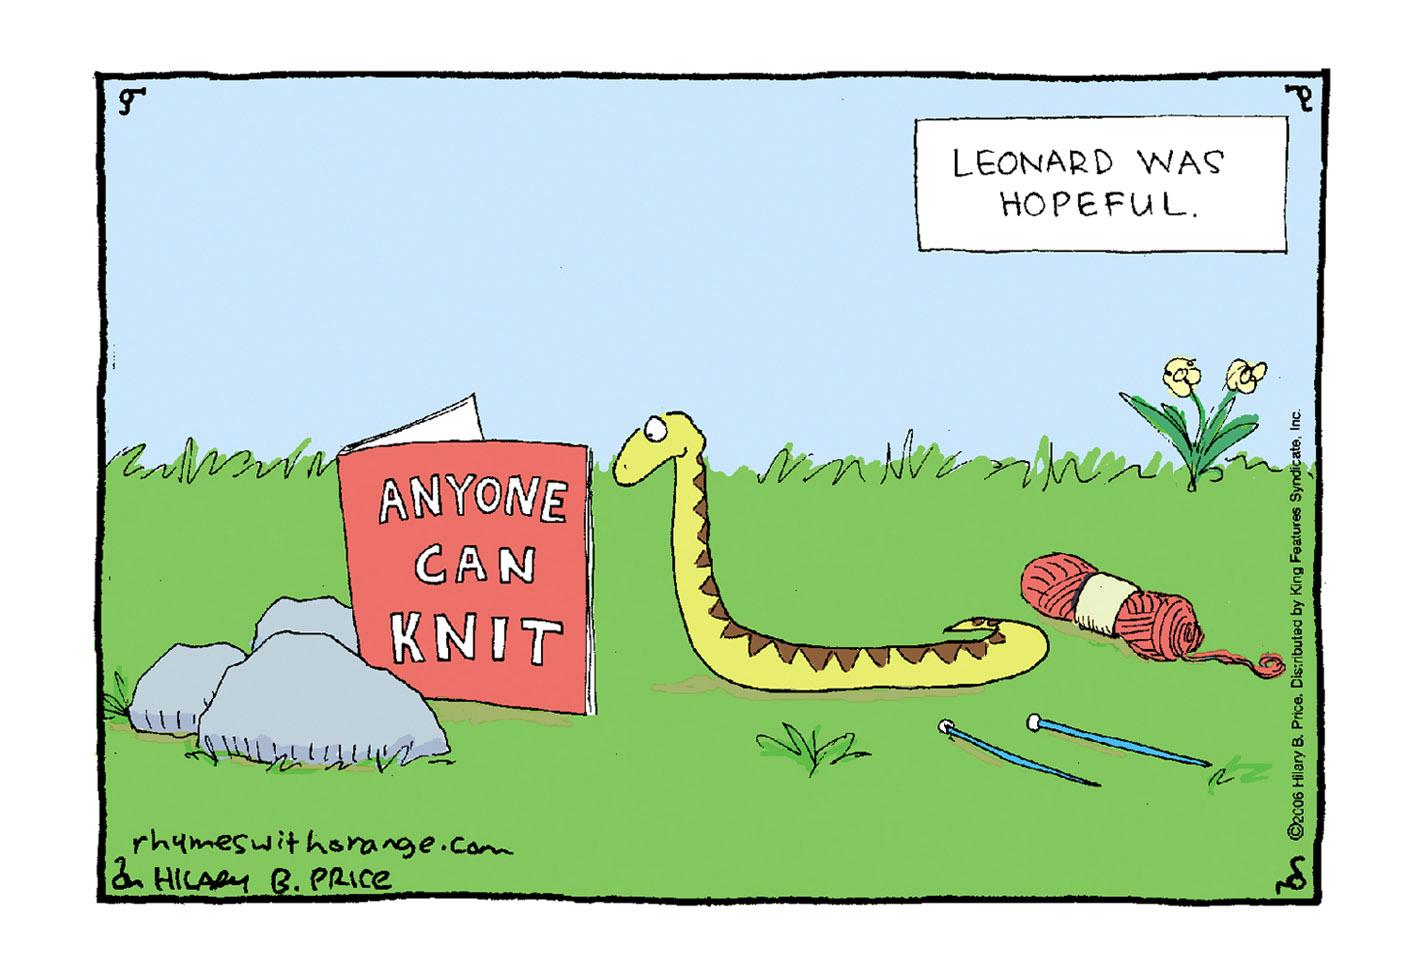 snake-knitting-knit-leonard-was-hopeful-hilary-price-comics-cartoons-cartoon-rhymeswithorange-rhymes-with-orange-speaker-storyteller-cartoonist-teacher